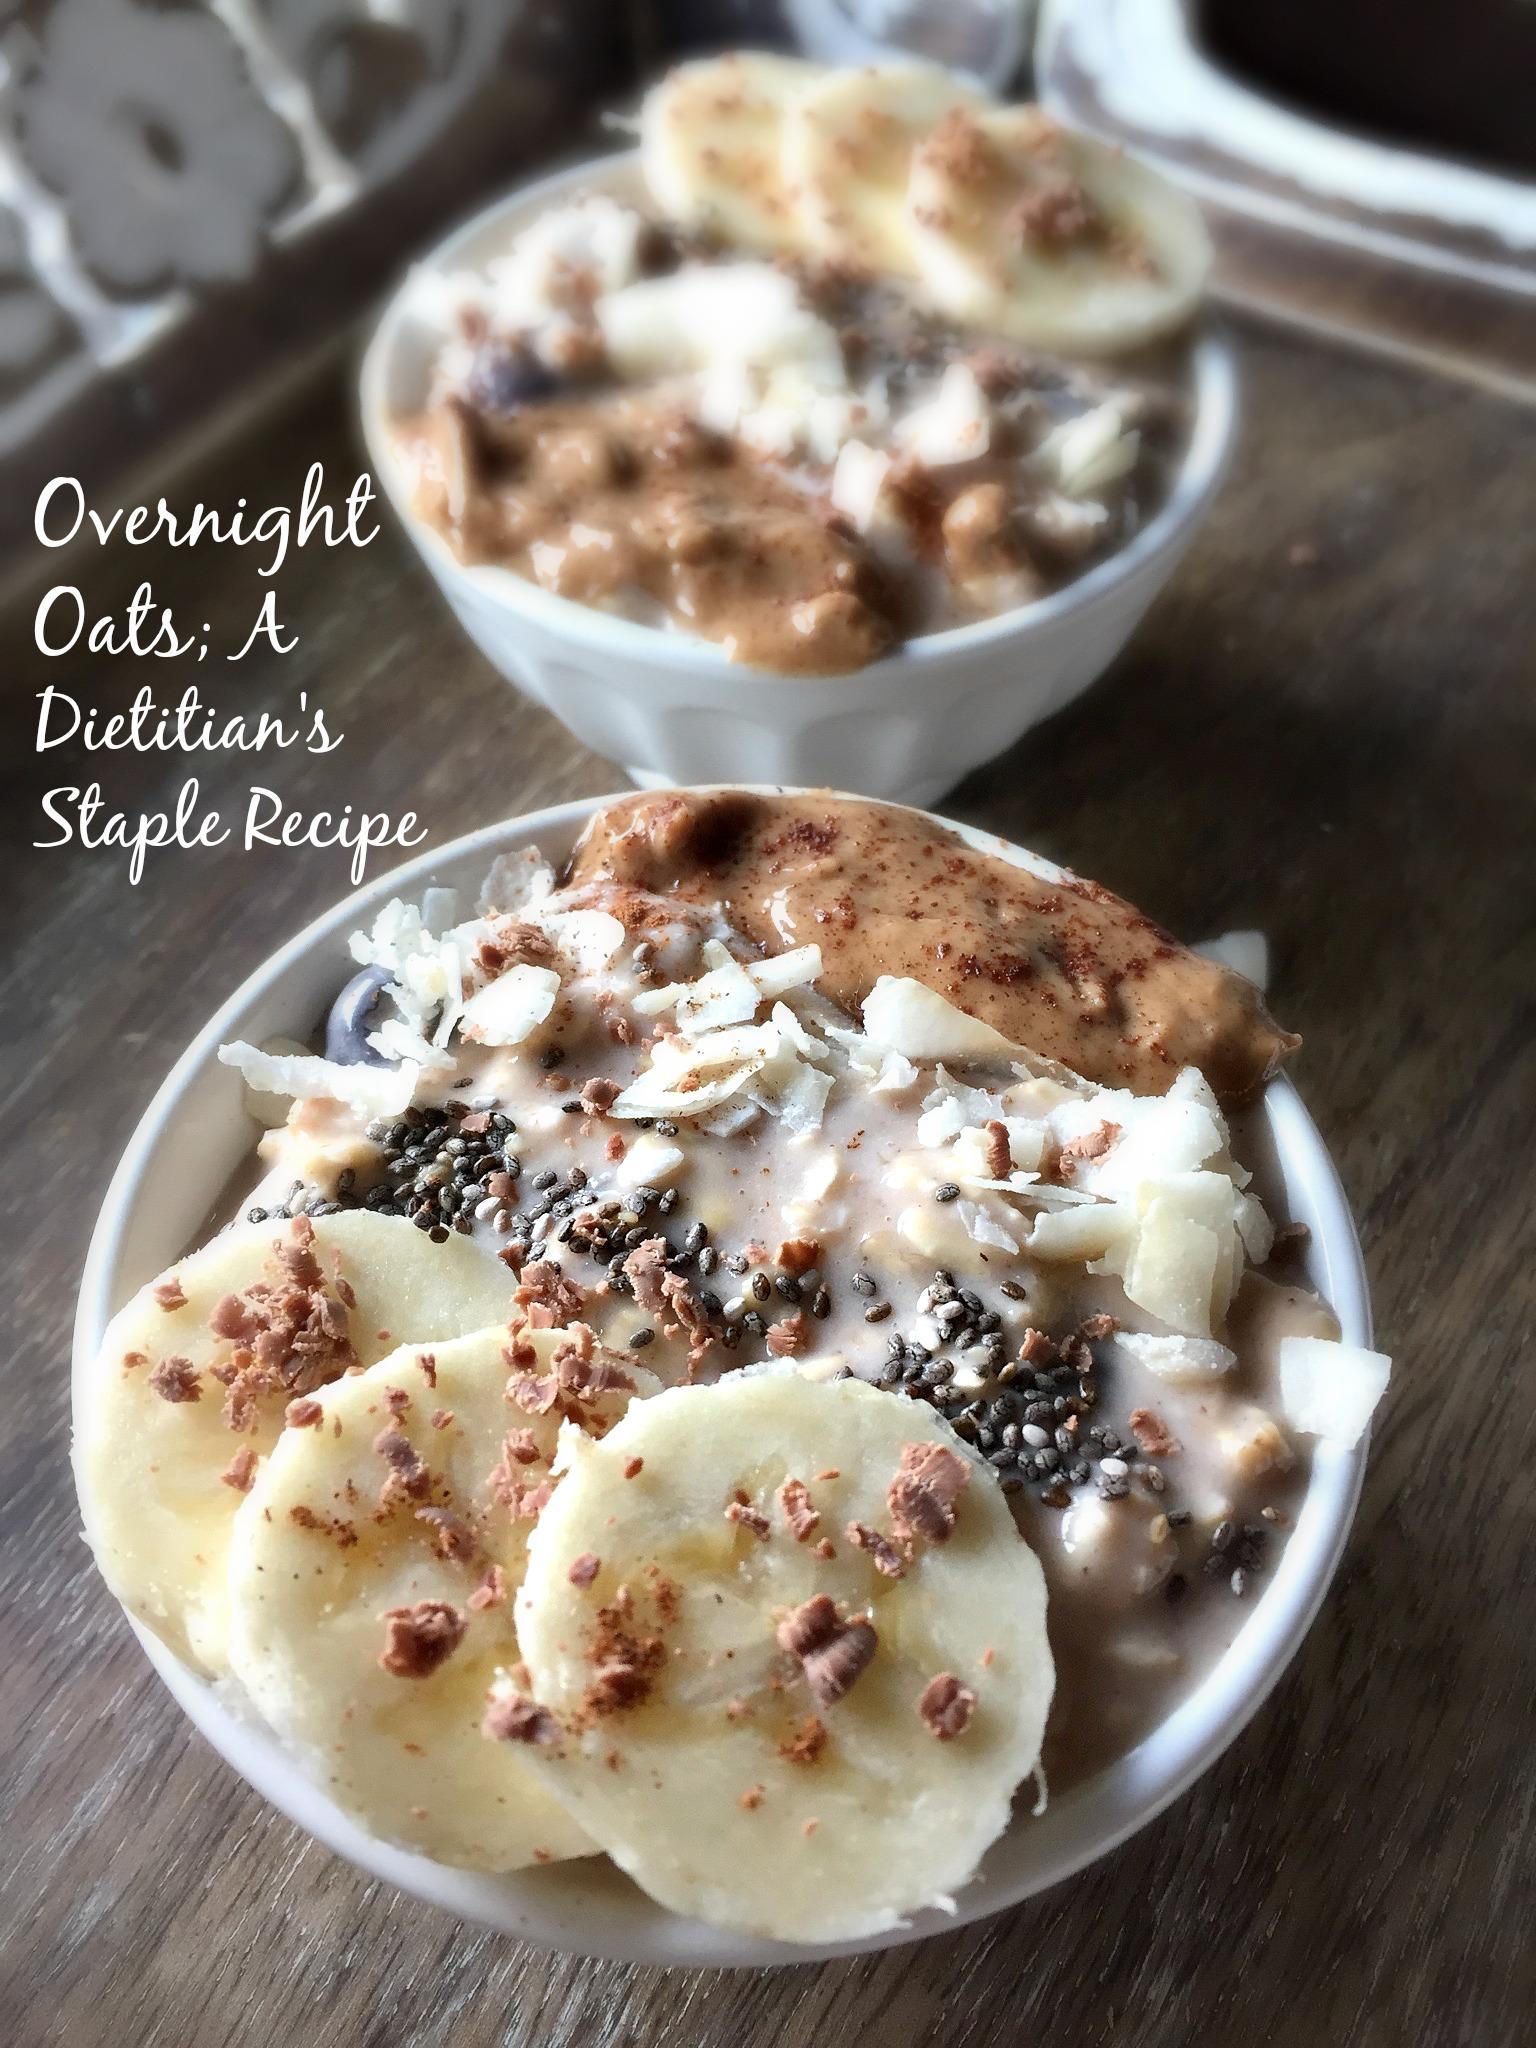 Overnight Oats – My Staple Recipe